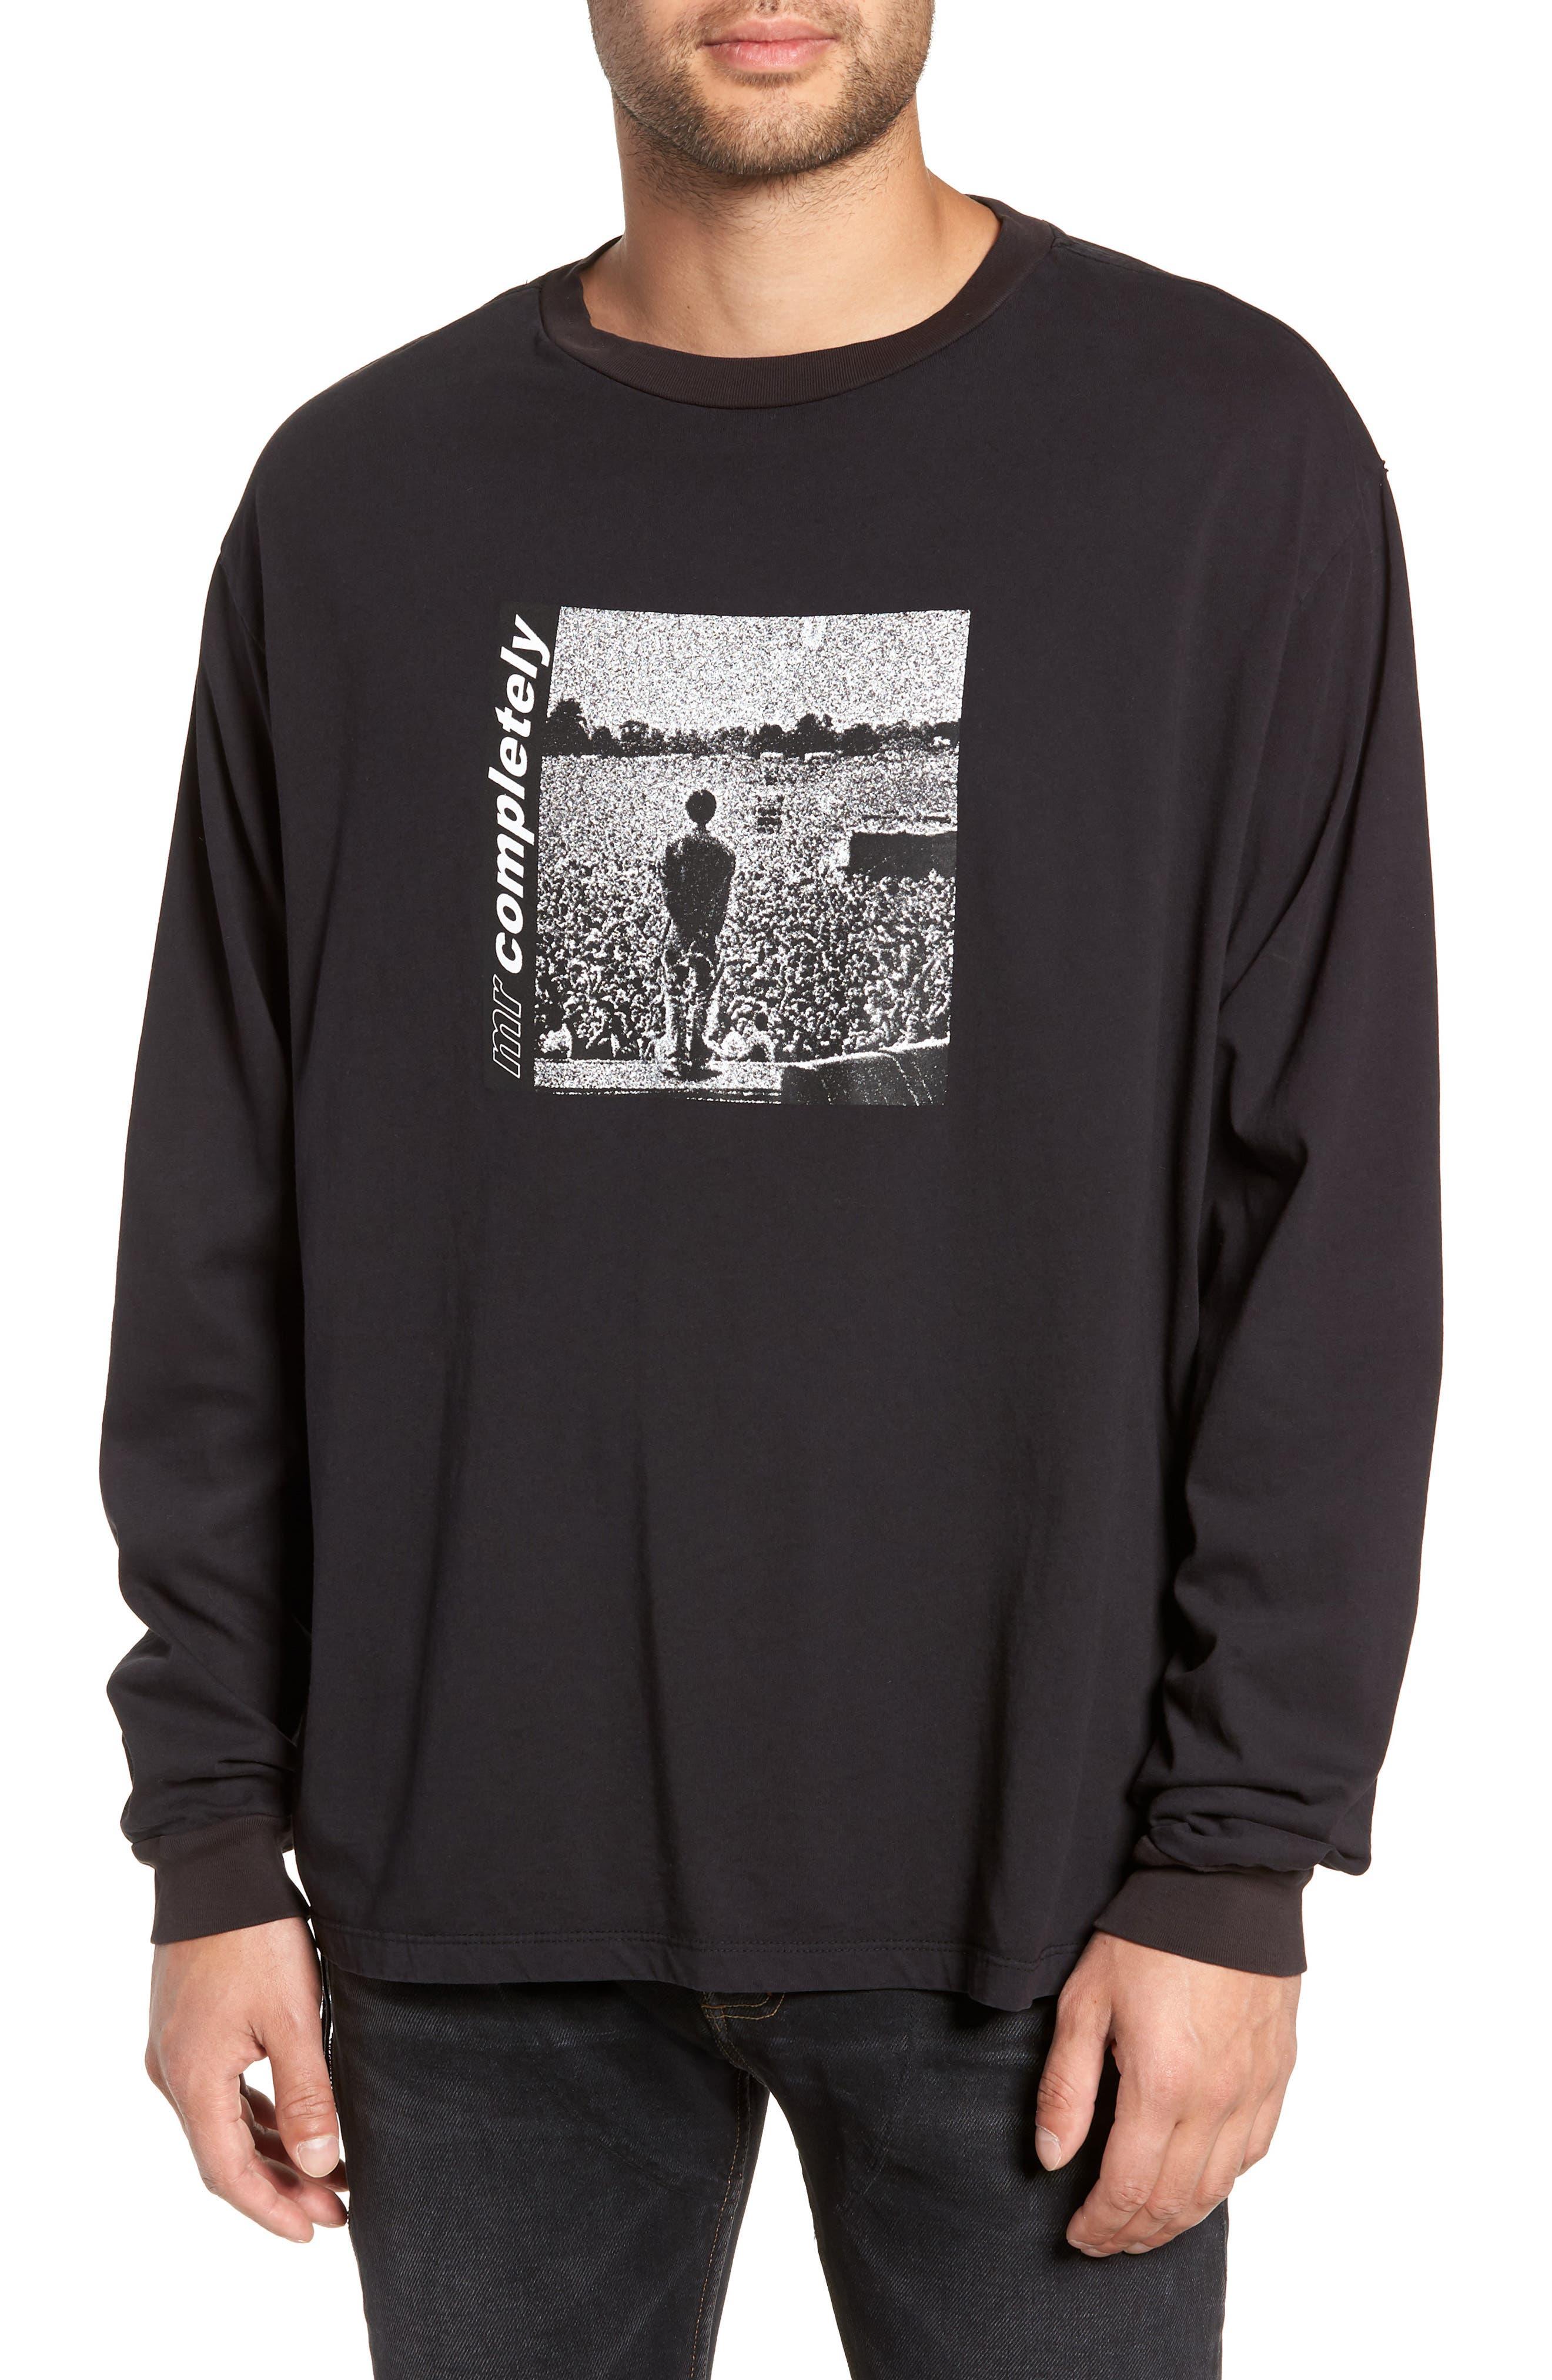 MR. COMPLETELY Oasis Oversize Long Sleeve T-Shirt in Black